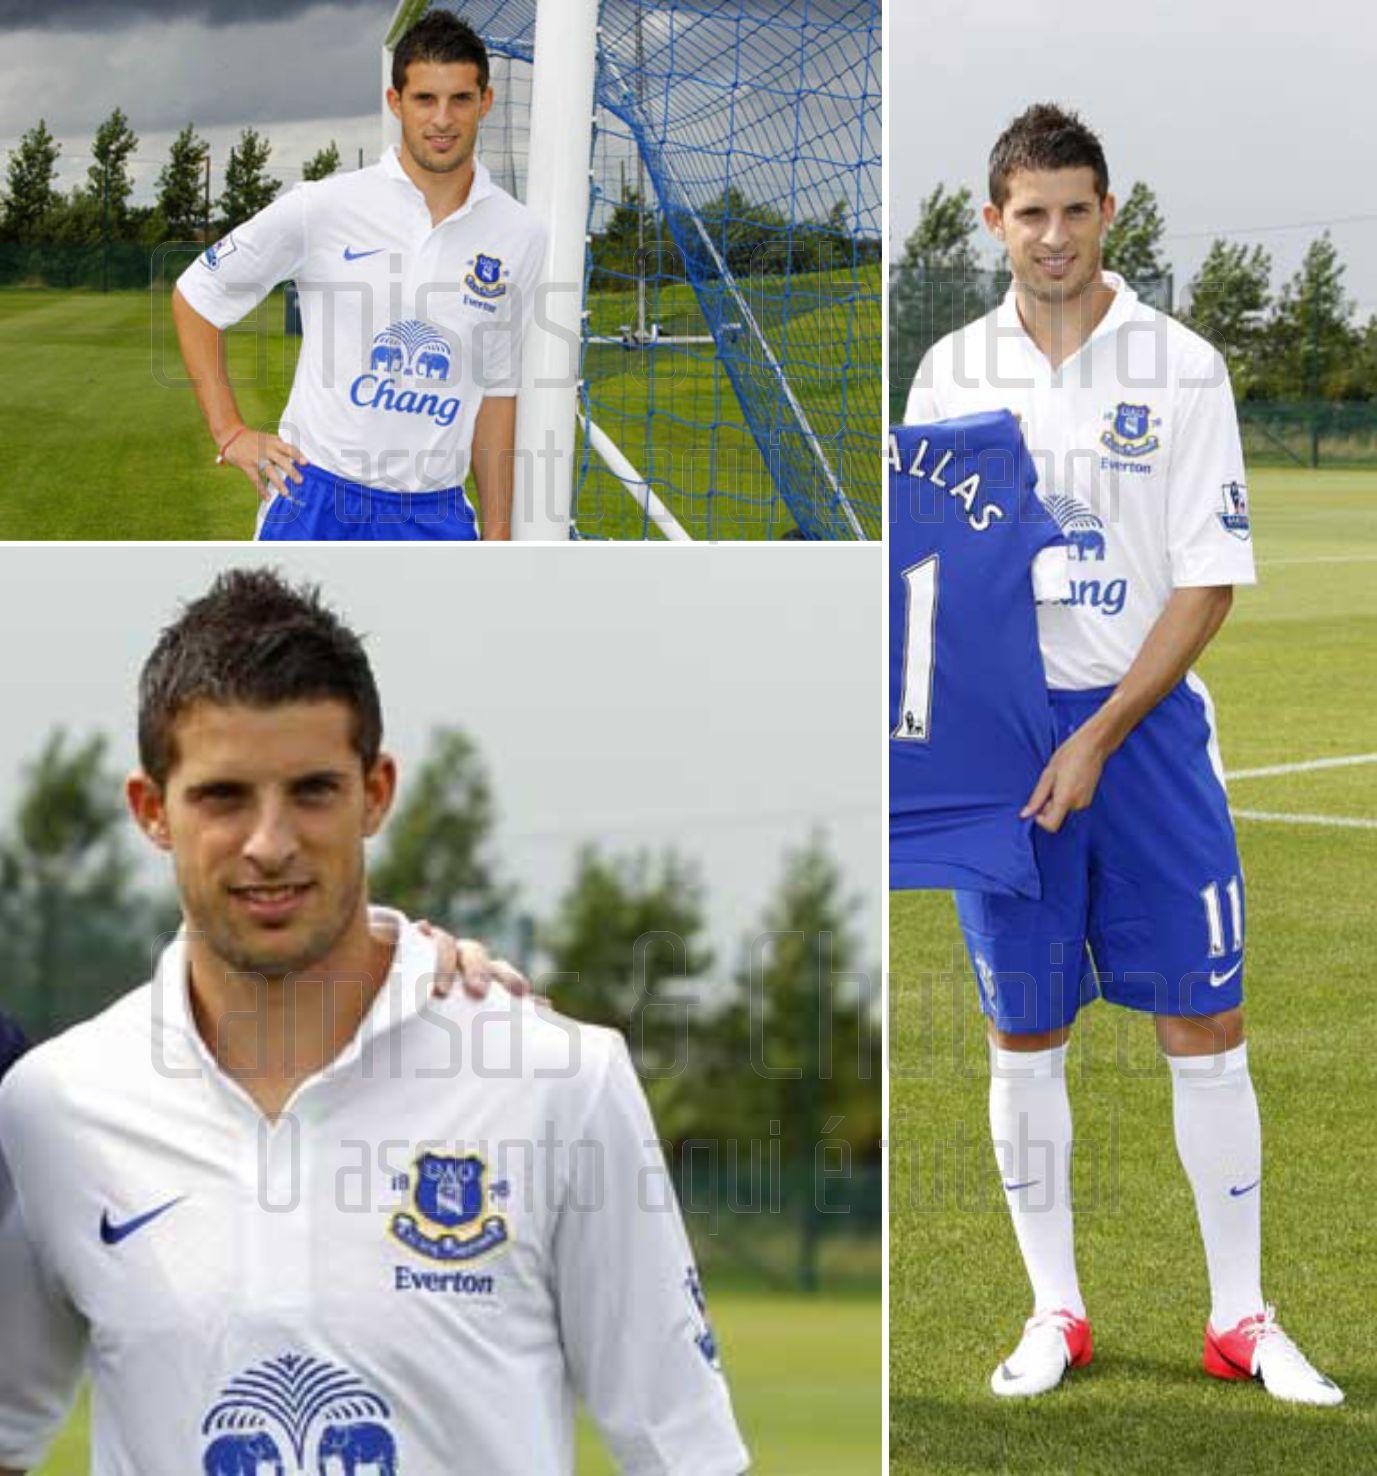 Everton 3e shirt